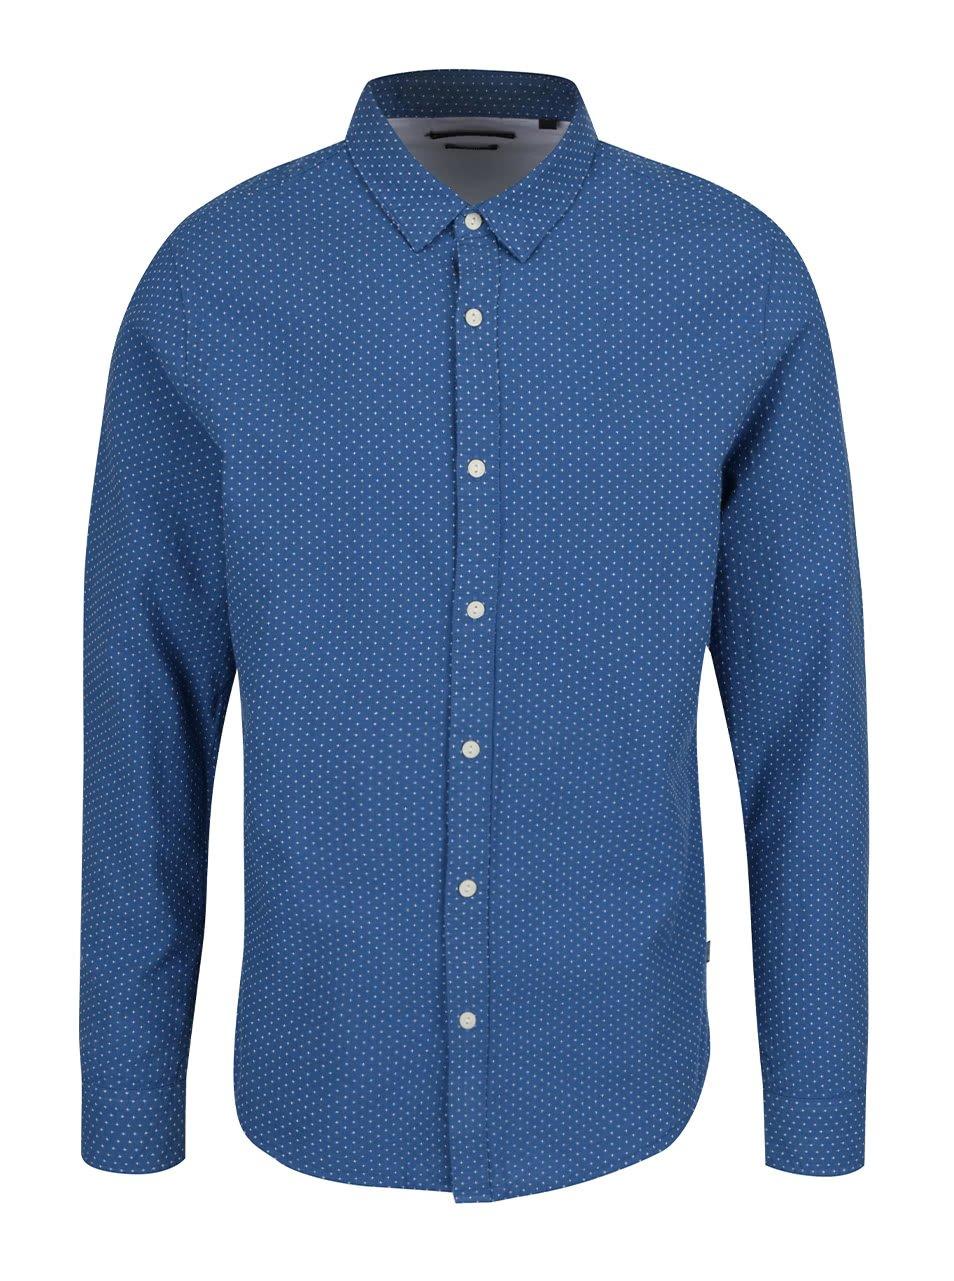 Modrá slim fit košile ONLY & SONS Conraad